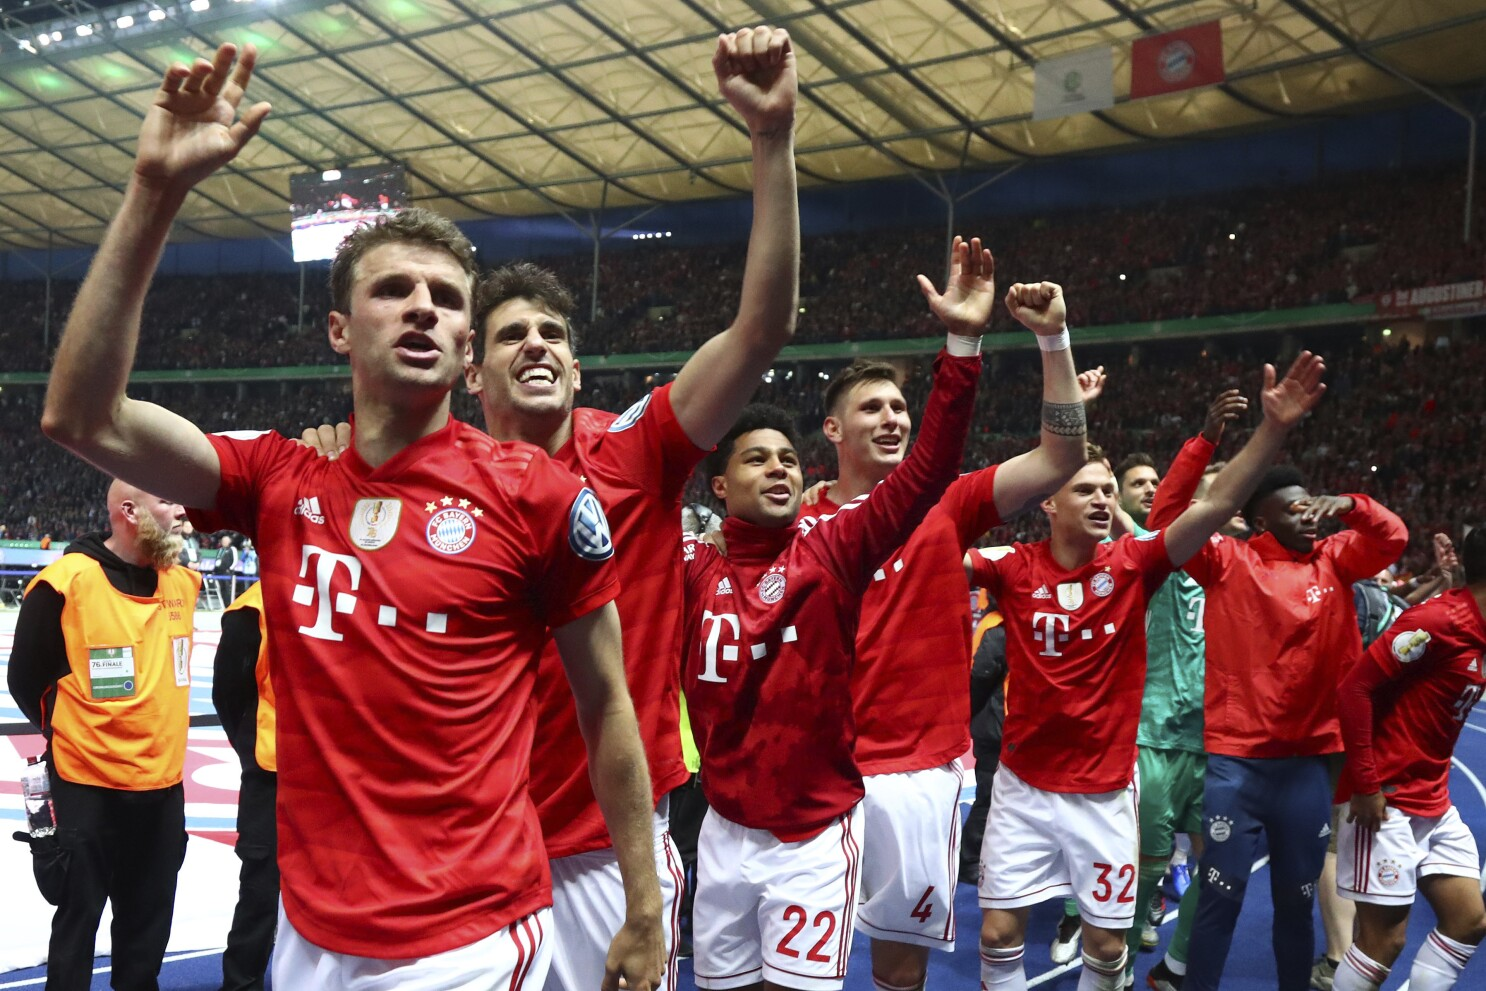 Arsenal and Bayern Munich meet at Dignity Health Sports Park in preseason tuneup - Los Angeles Times